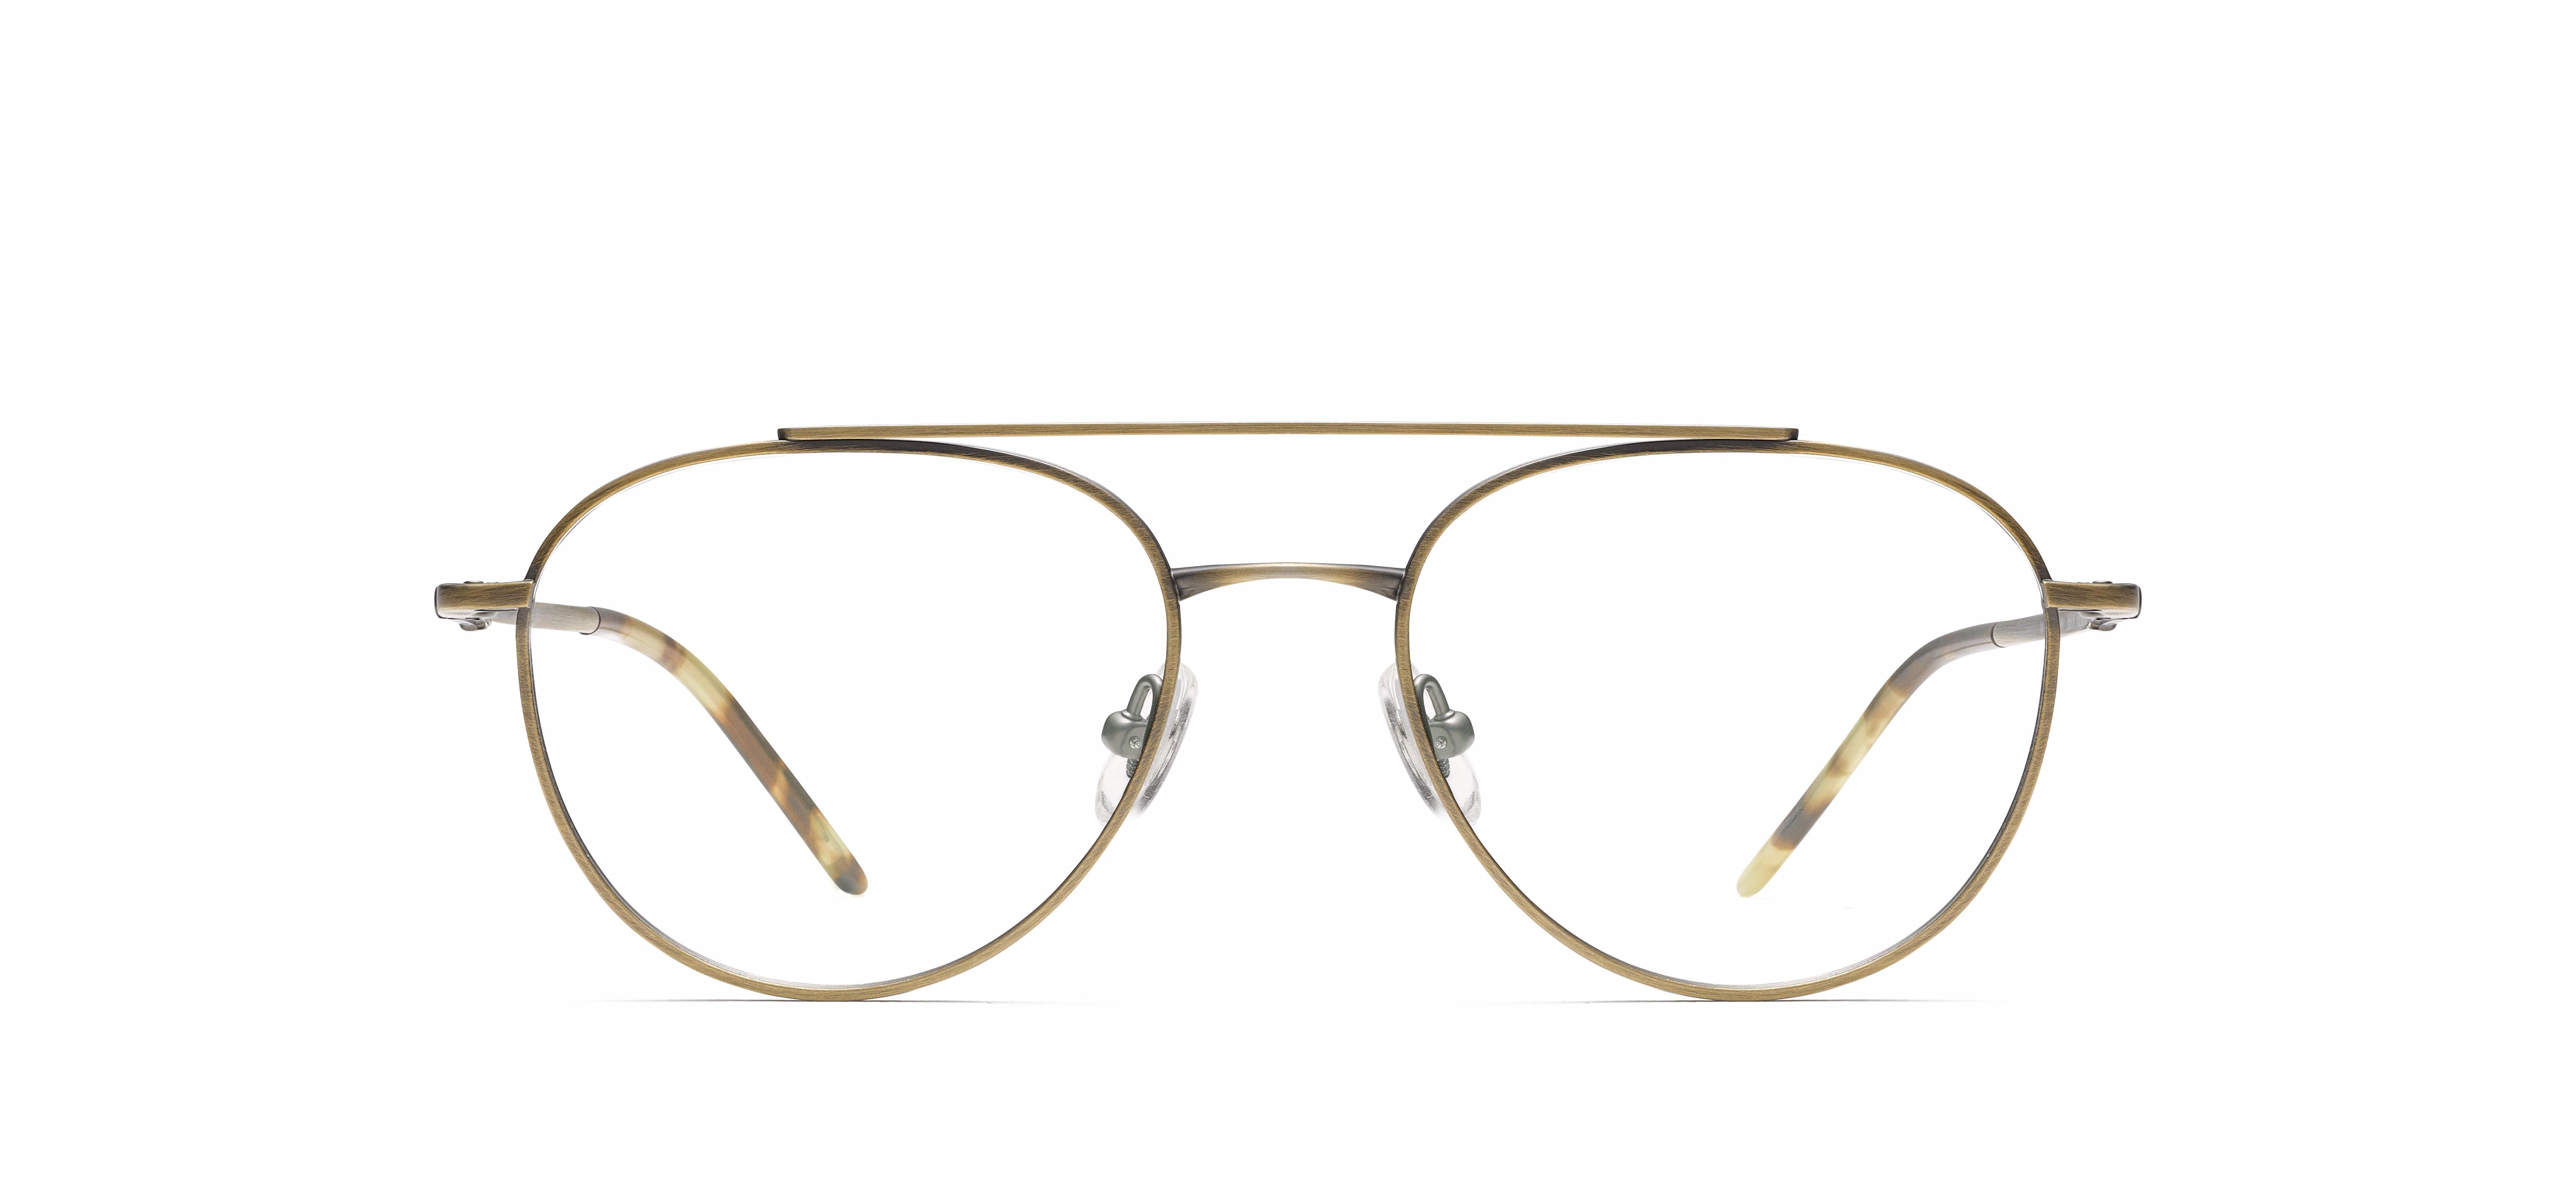 Robert Marc eyewear Montreal